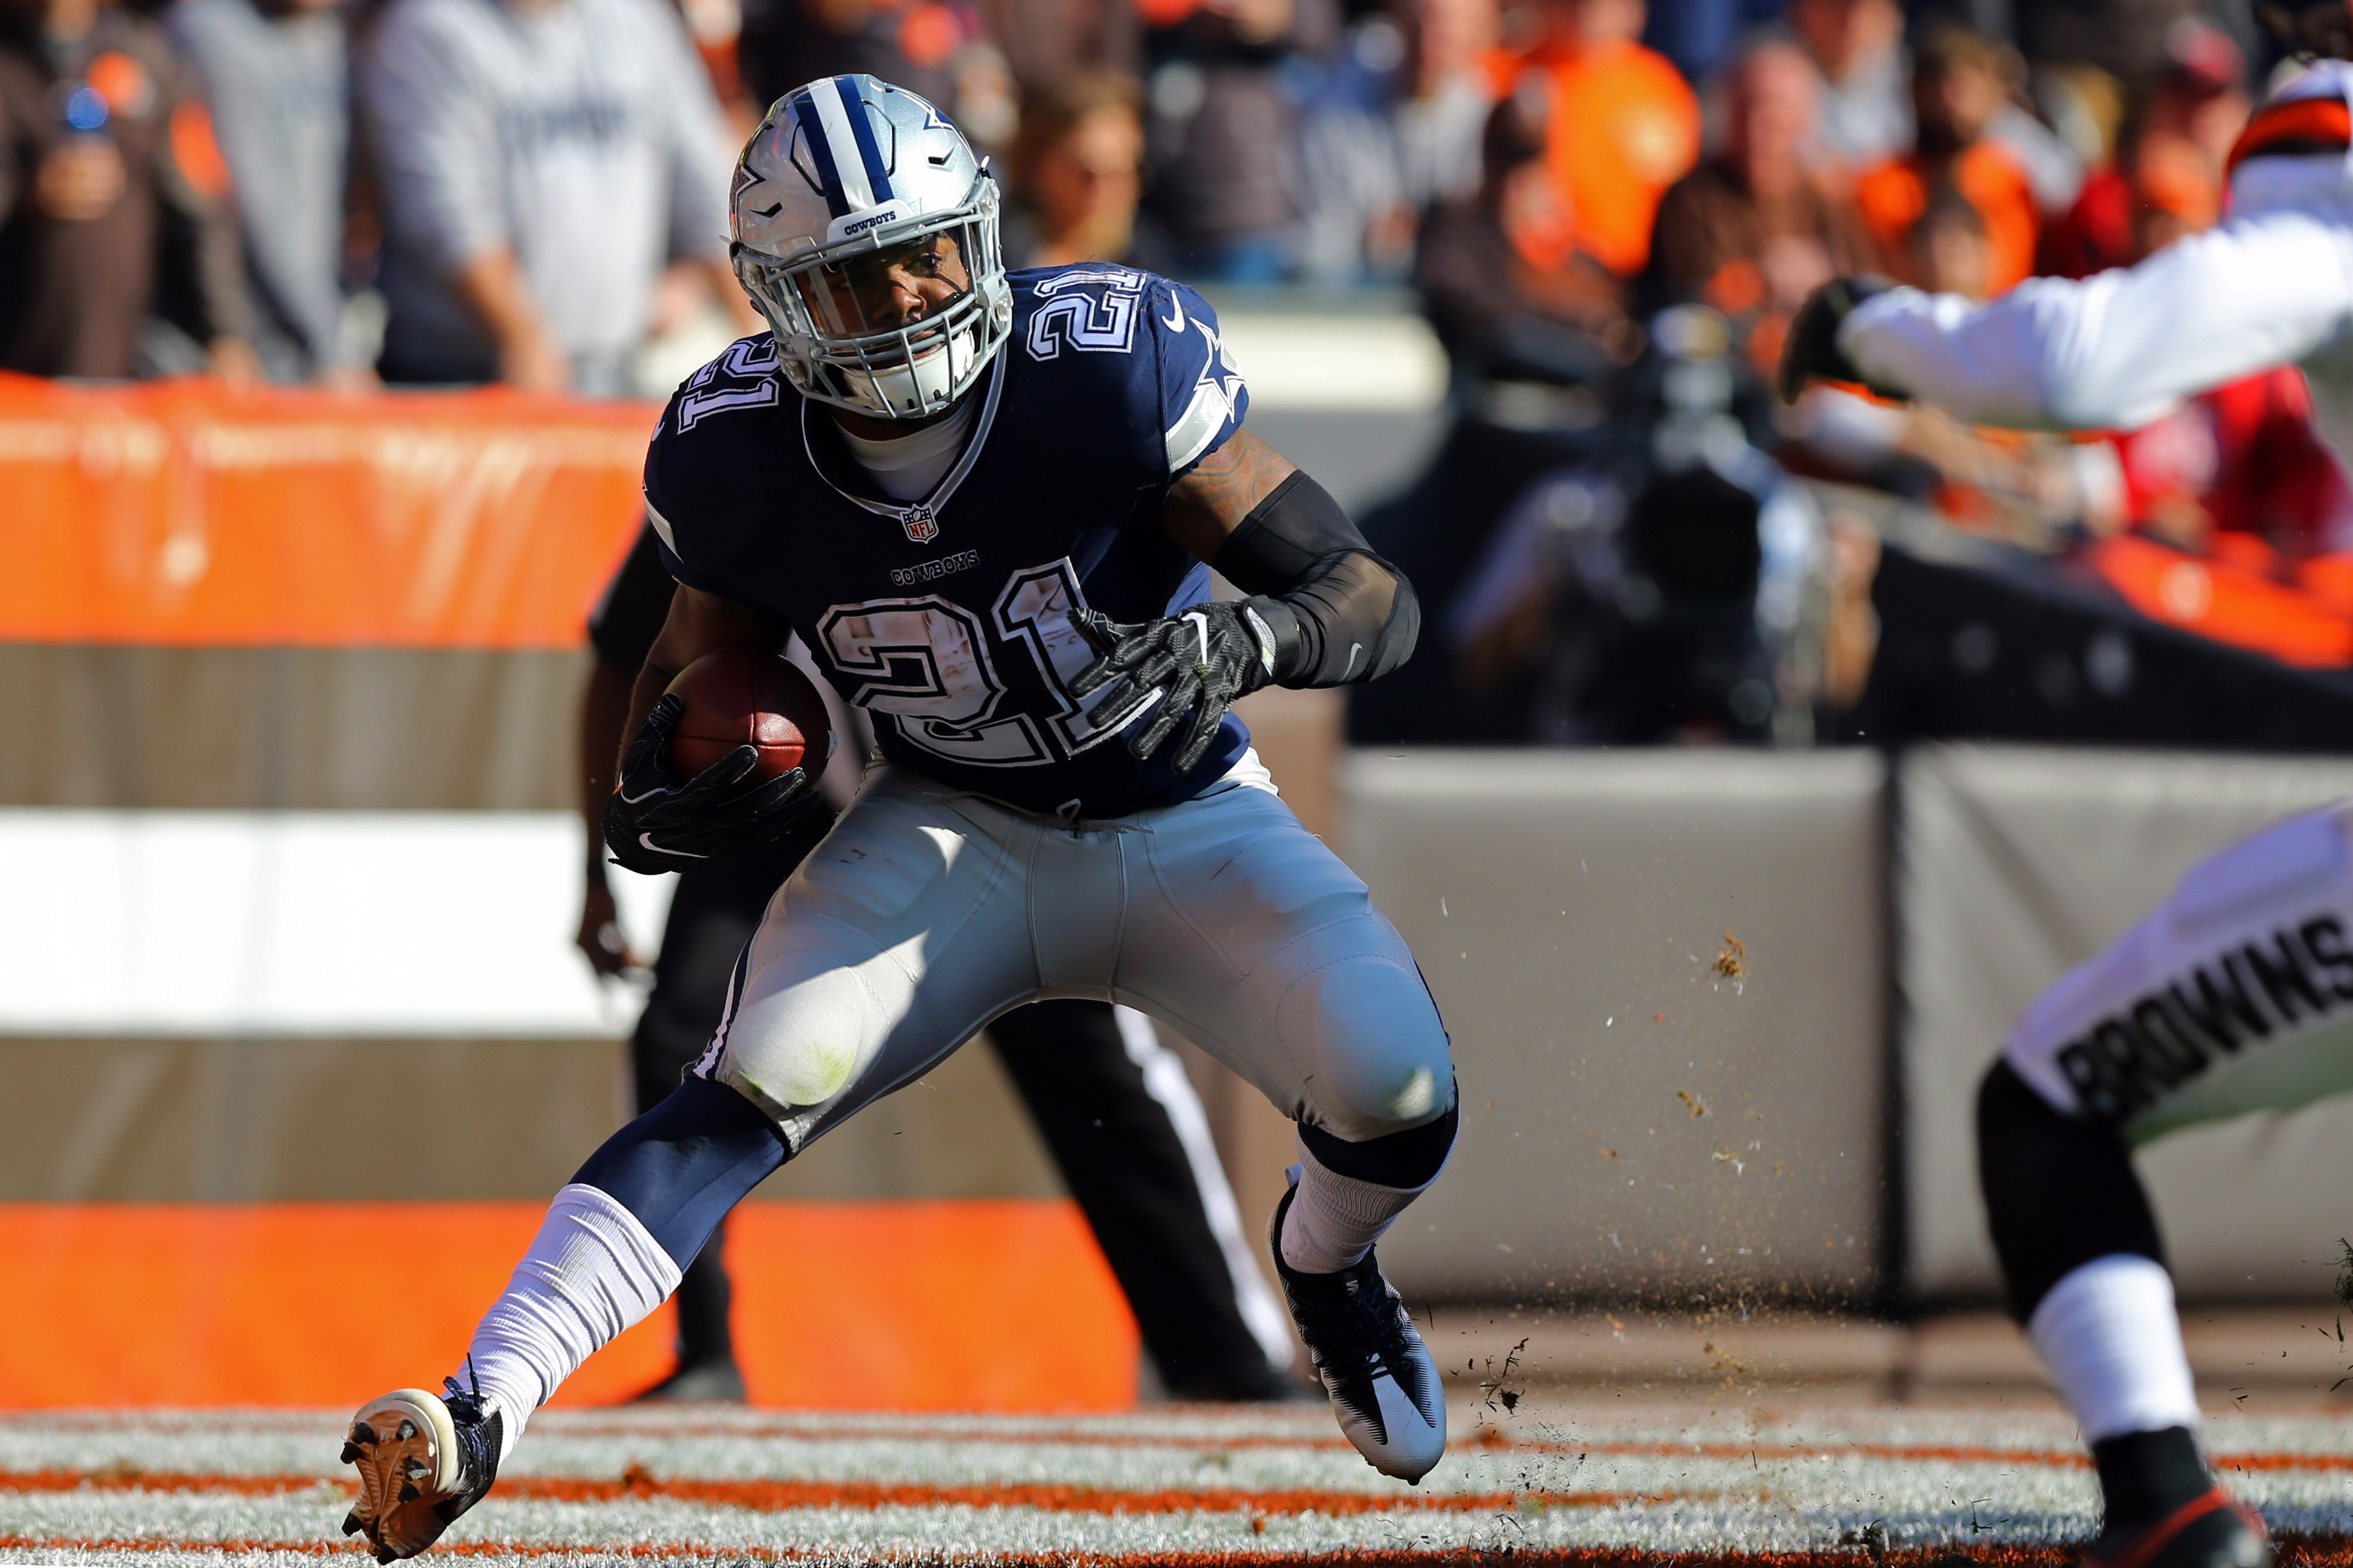 NFL: Dallas Cowboys at Cleveland Browns